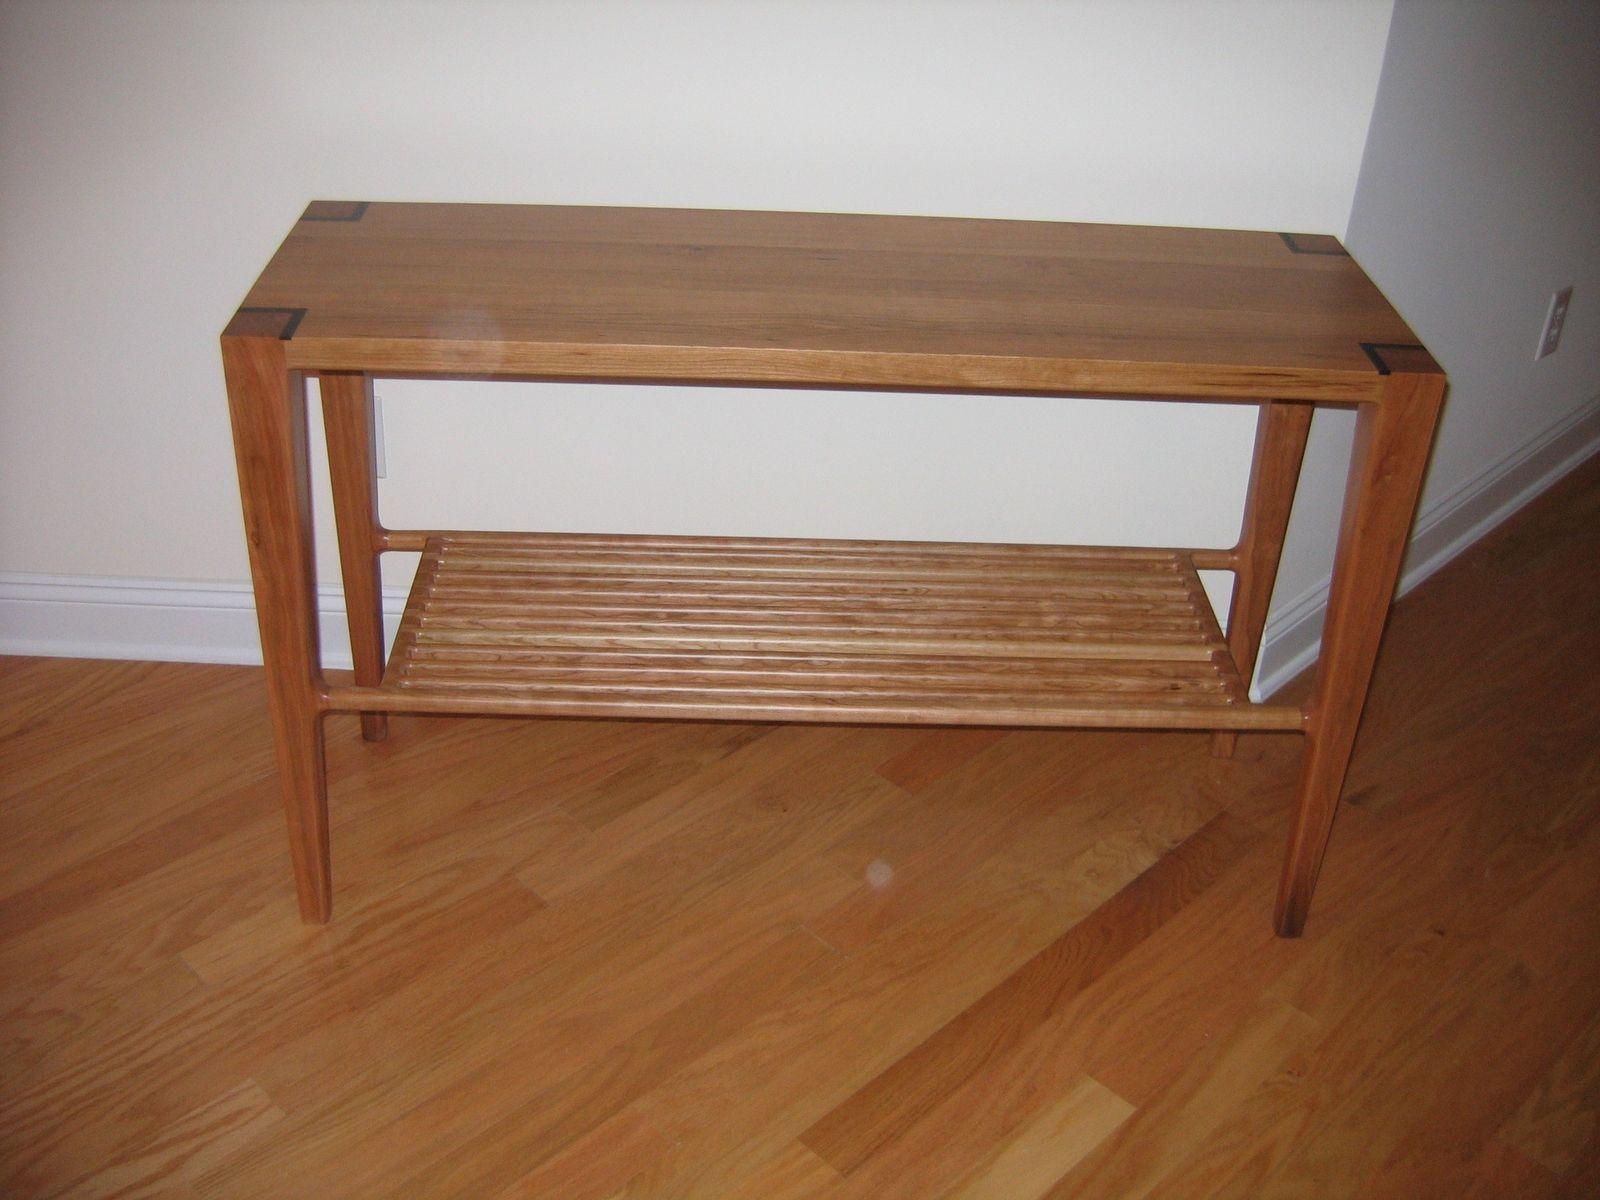 Handmade Cherry Hallway Table With Slat Shelf by David Naso